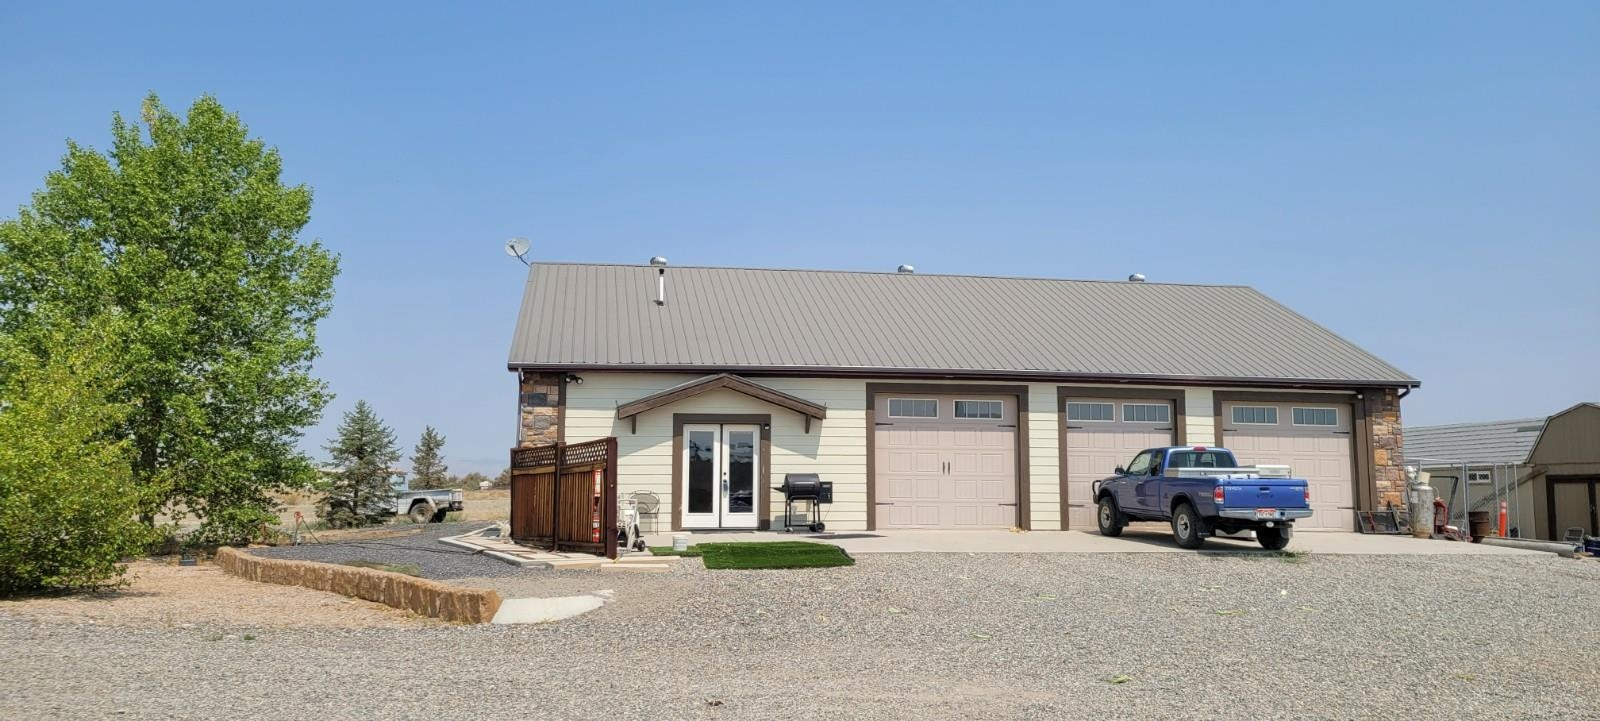 1610 18 Road Property Photo 1